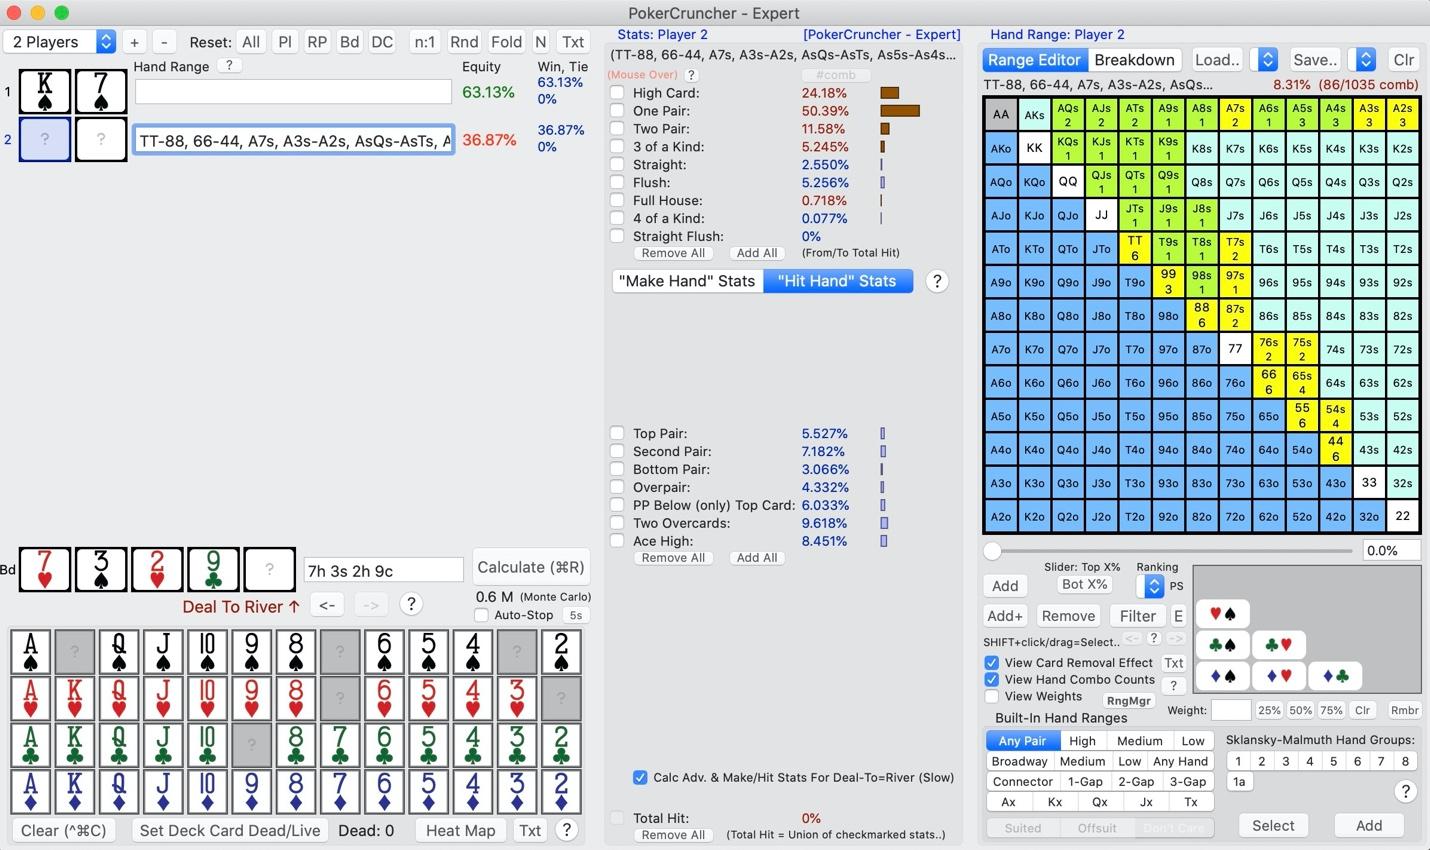 Understanding Equities vs. Ranges on the Turn in Poker